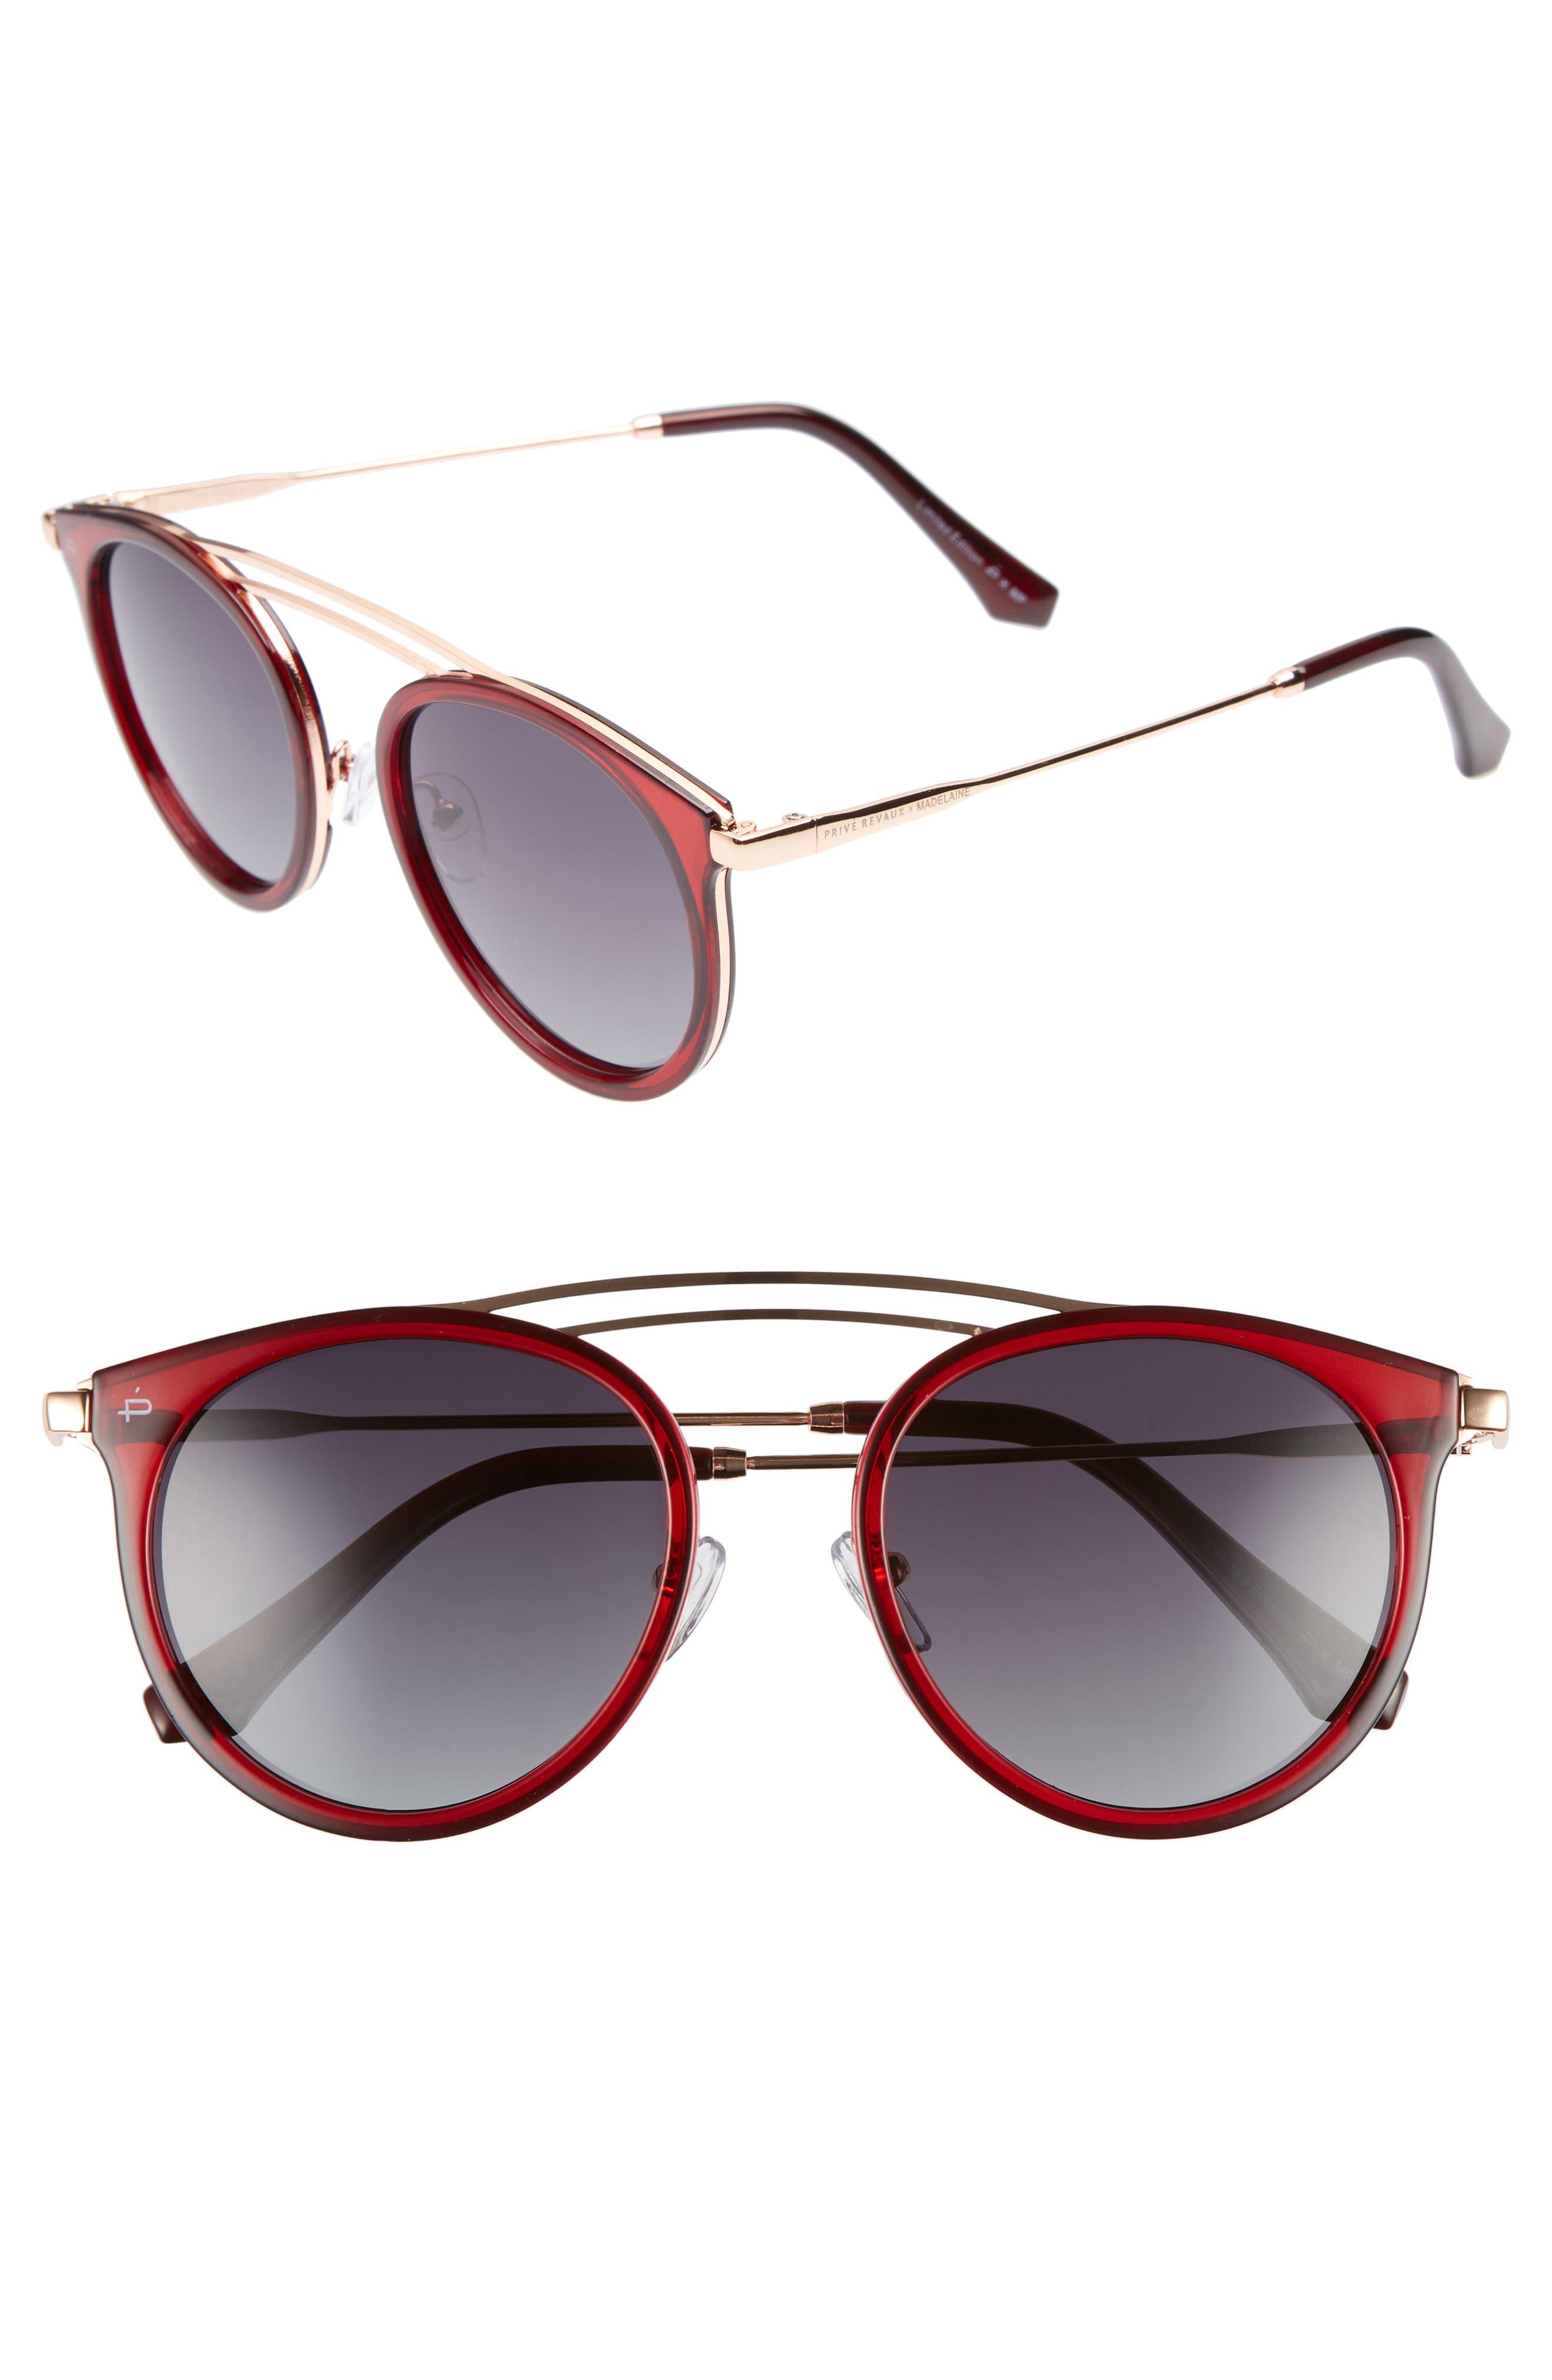 Privé Revaux x Madelaine Petsch The Rogue 50mm Sunglasses